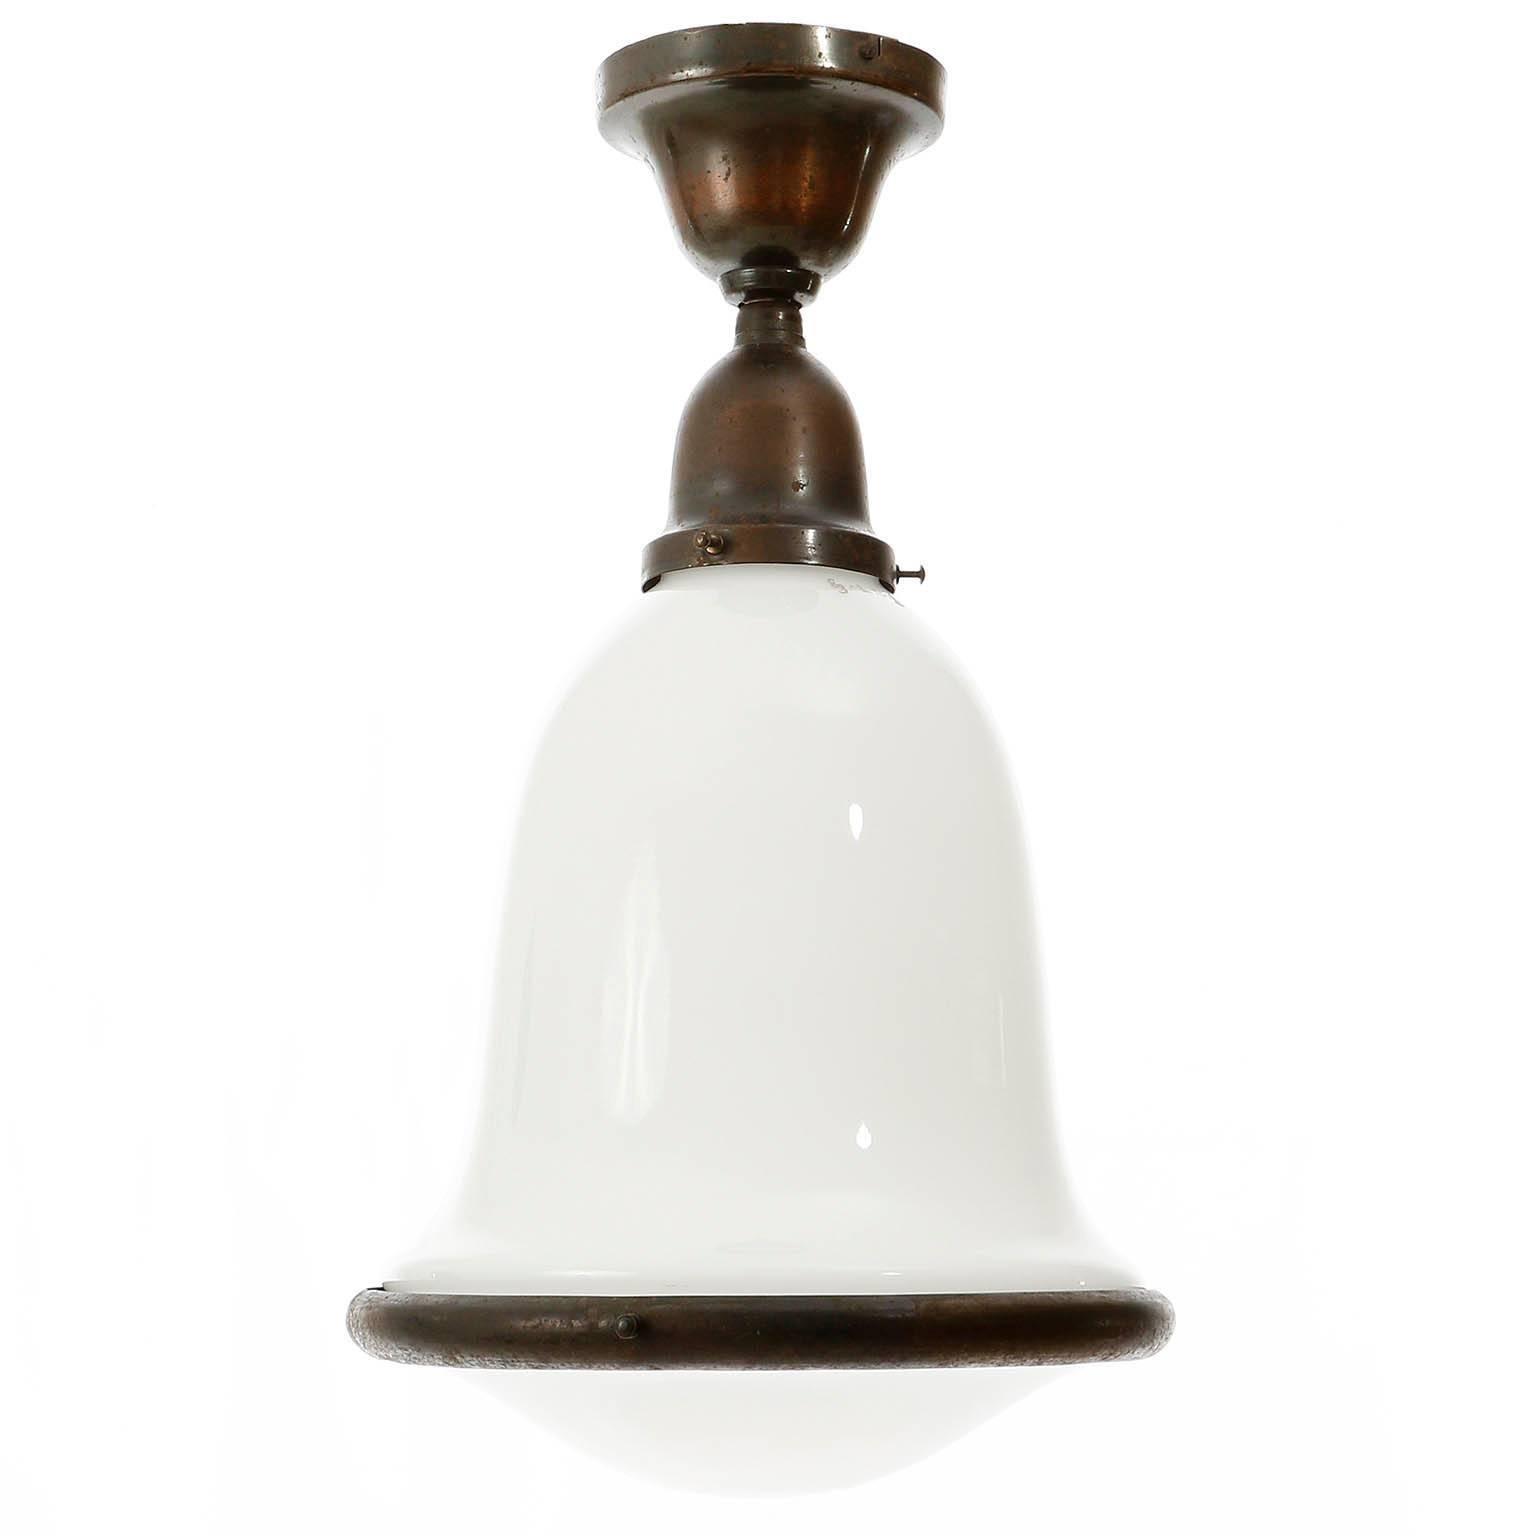 co smsender tulum ceiling ceilings fixture mount light